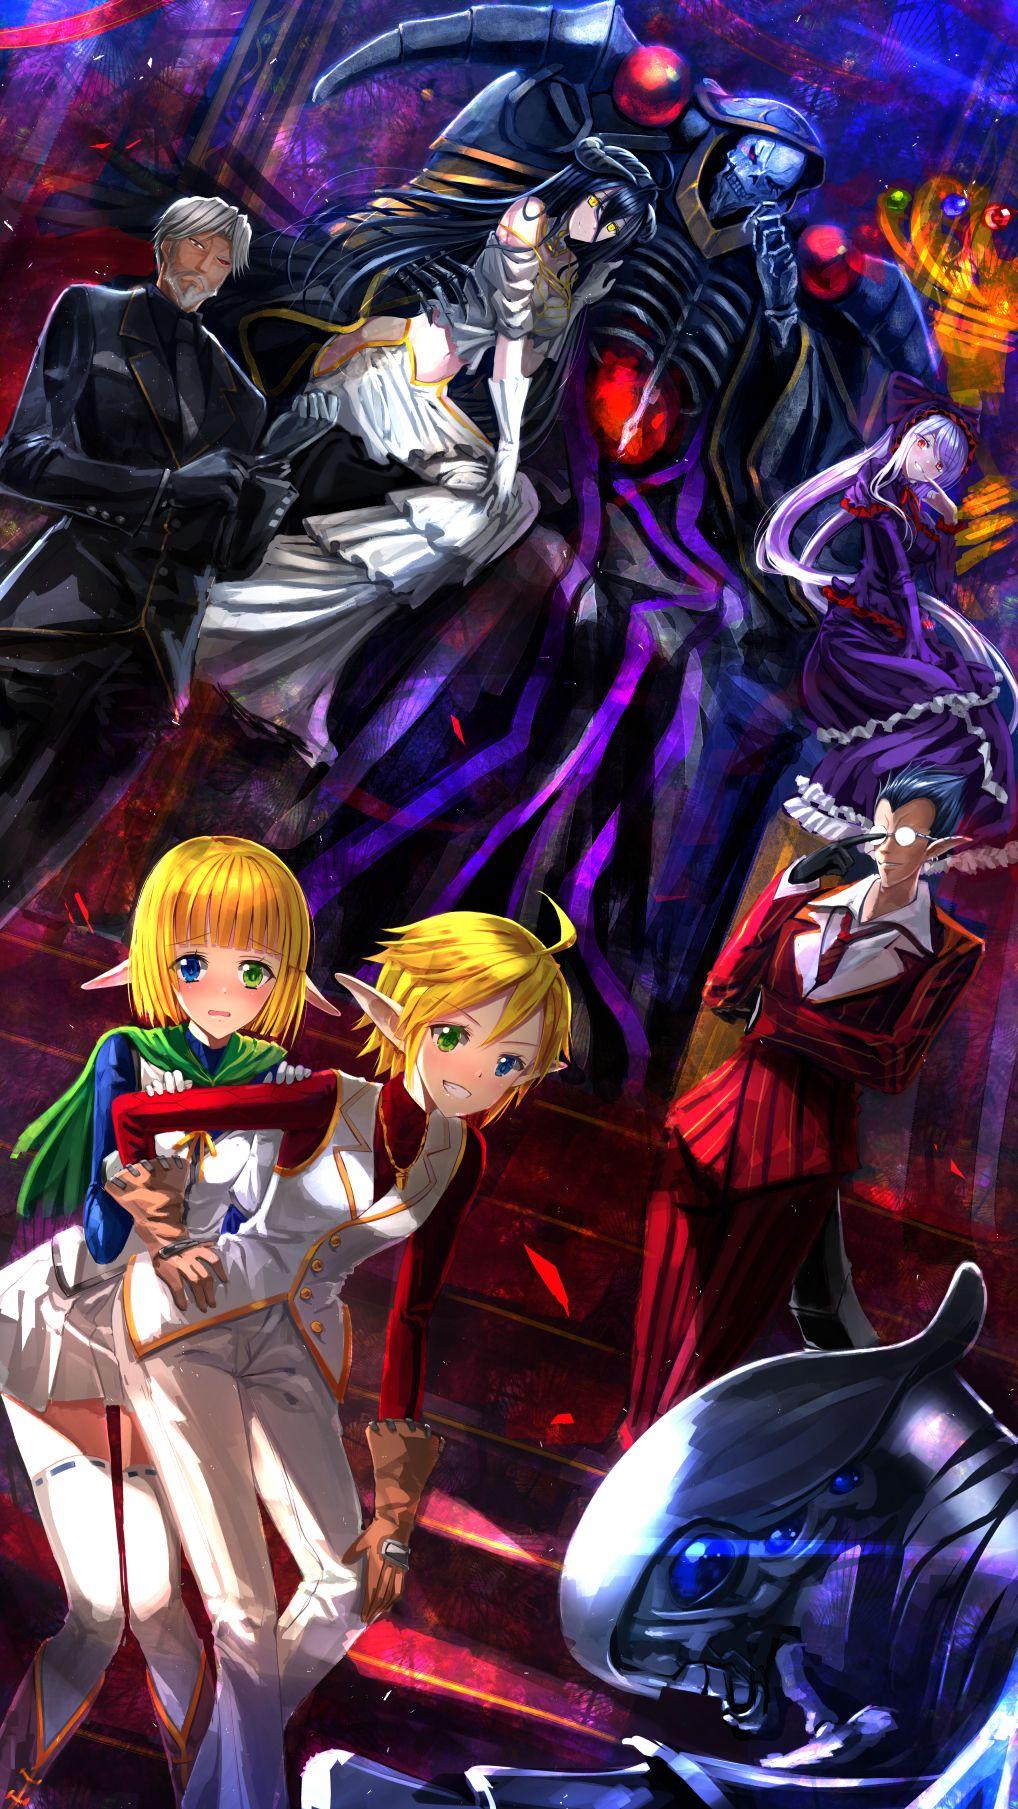 Lord Ainz Anime Wallpaper Anime Overlord Anime Season 2